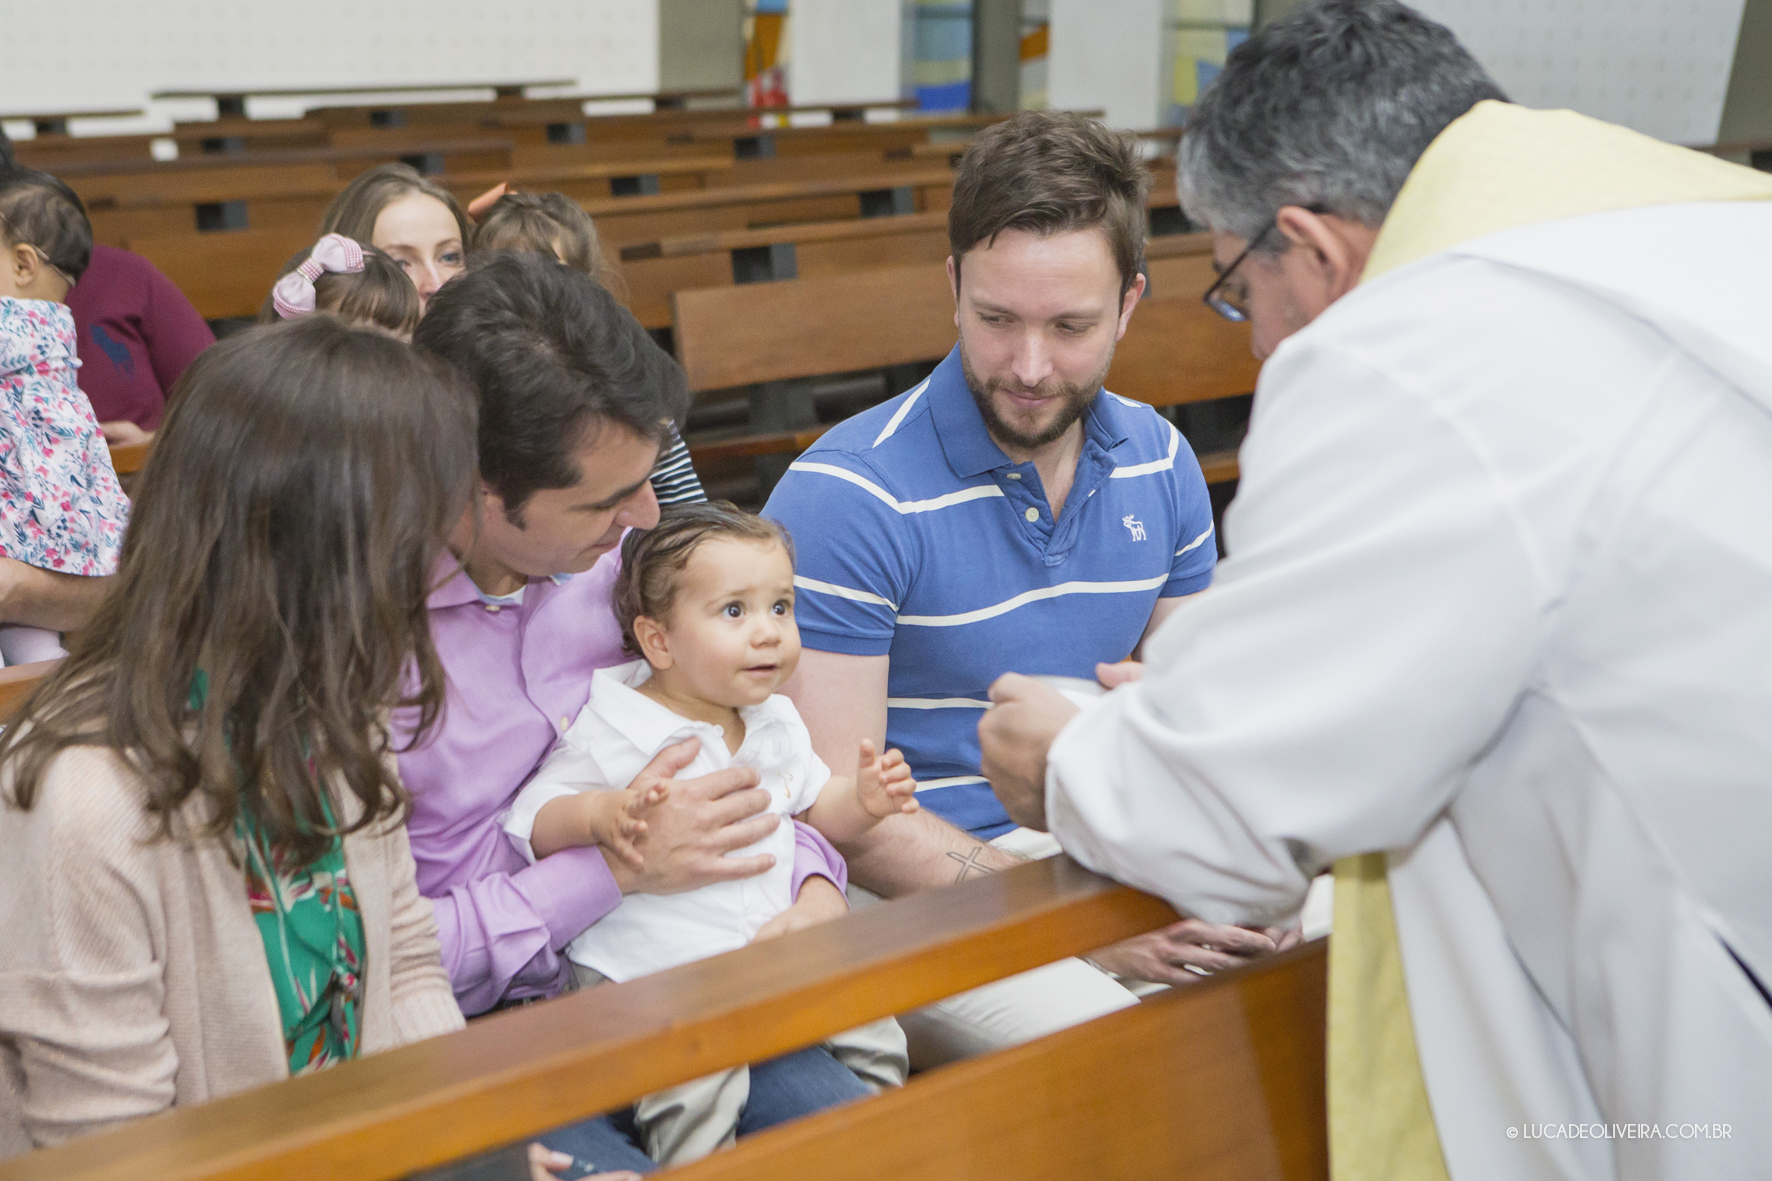 batizadosaopedorsaopaulo_lucadeoliveira_067